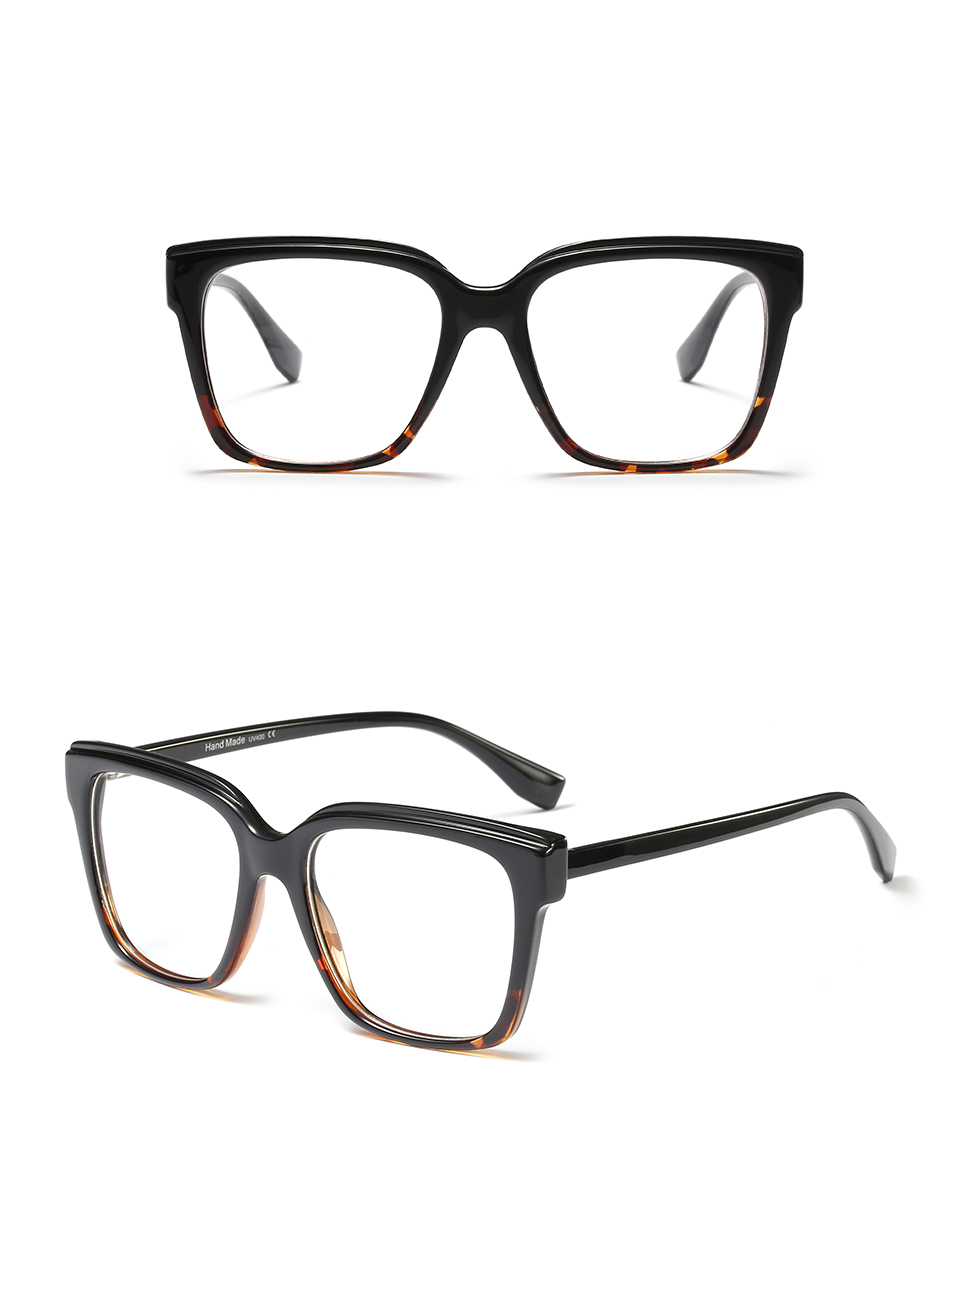 bc089e9f0ce 2019 Peekaboo Black Square Eyeglass Frames Women Accessories Clear ...